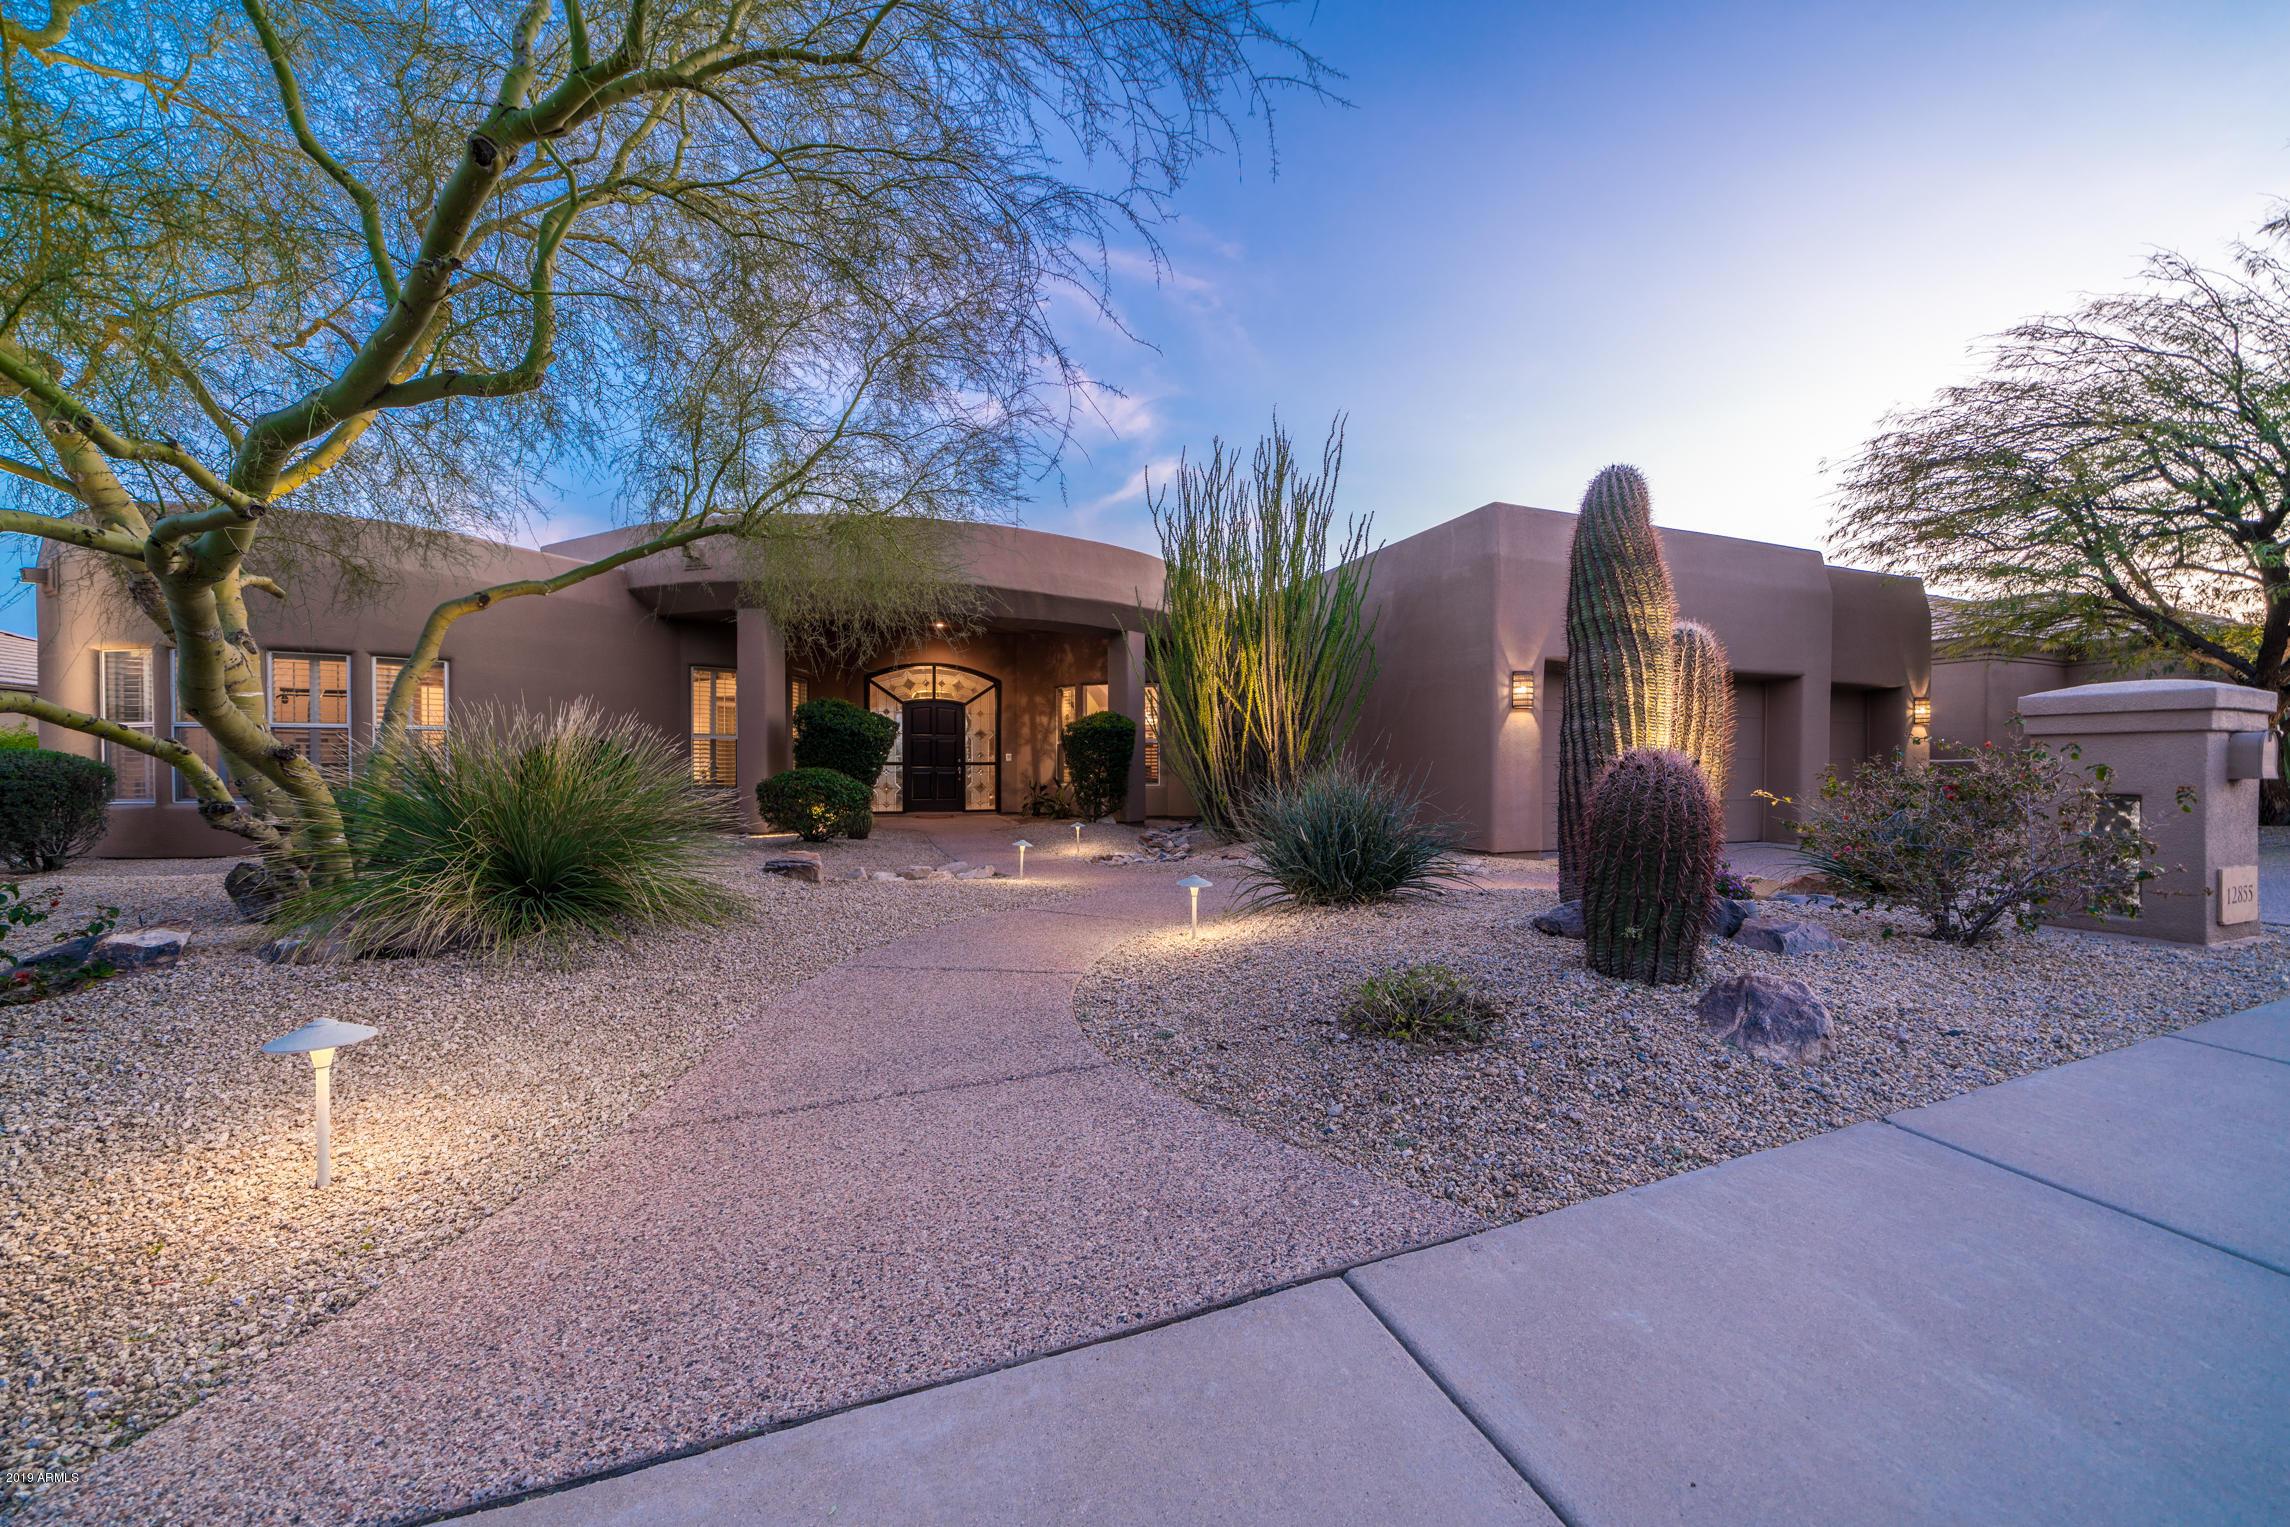 Photo of 12855 E Summit Drive, Scottsdale, AZ 85259